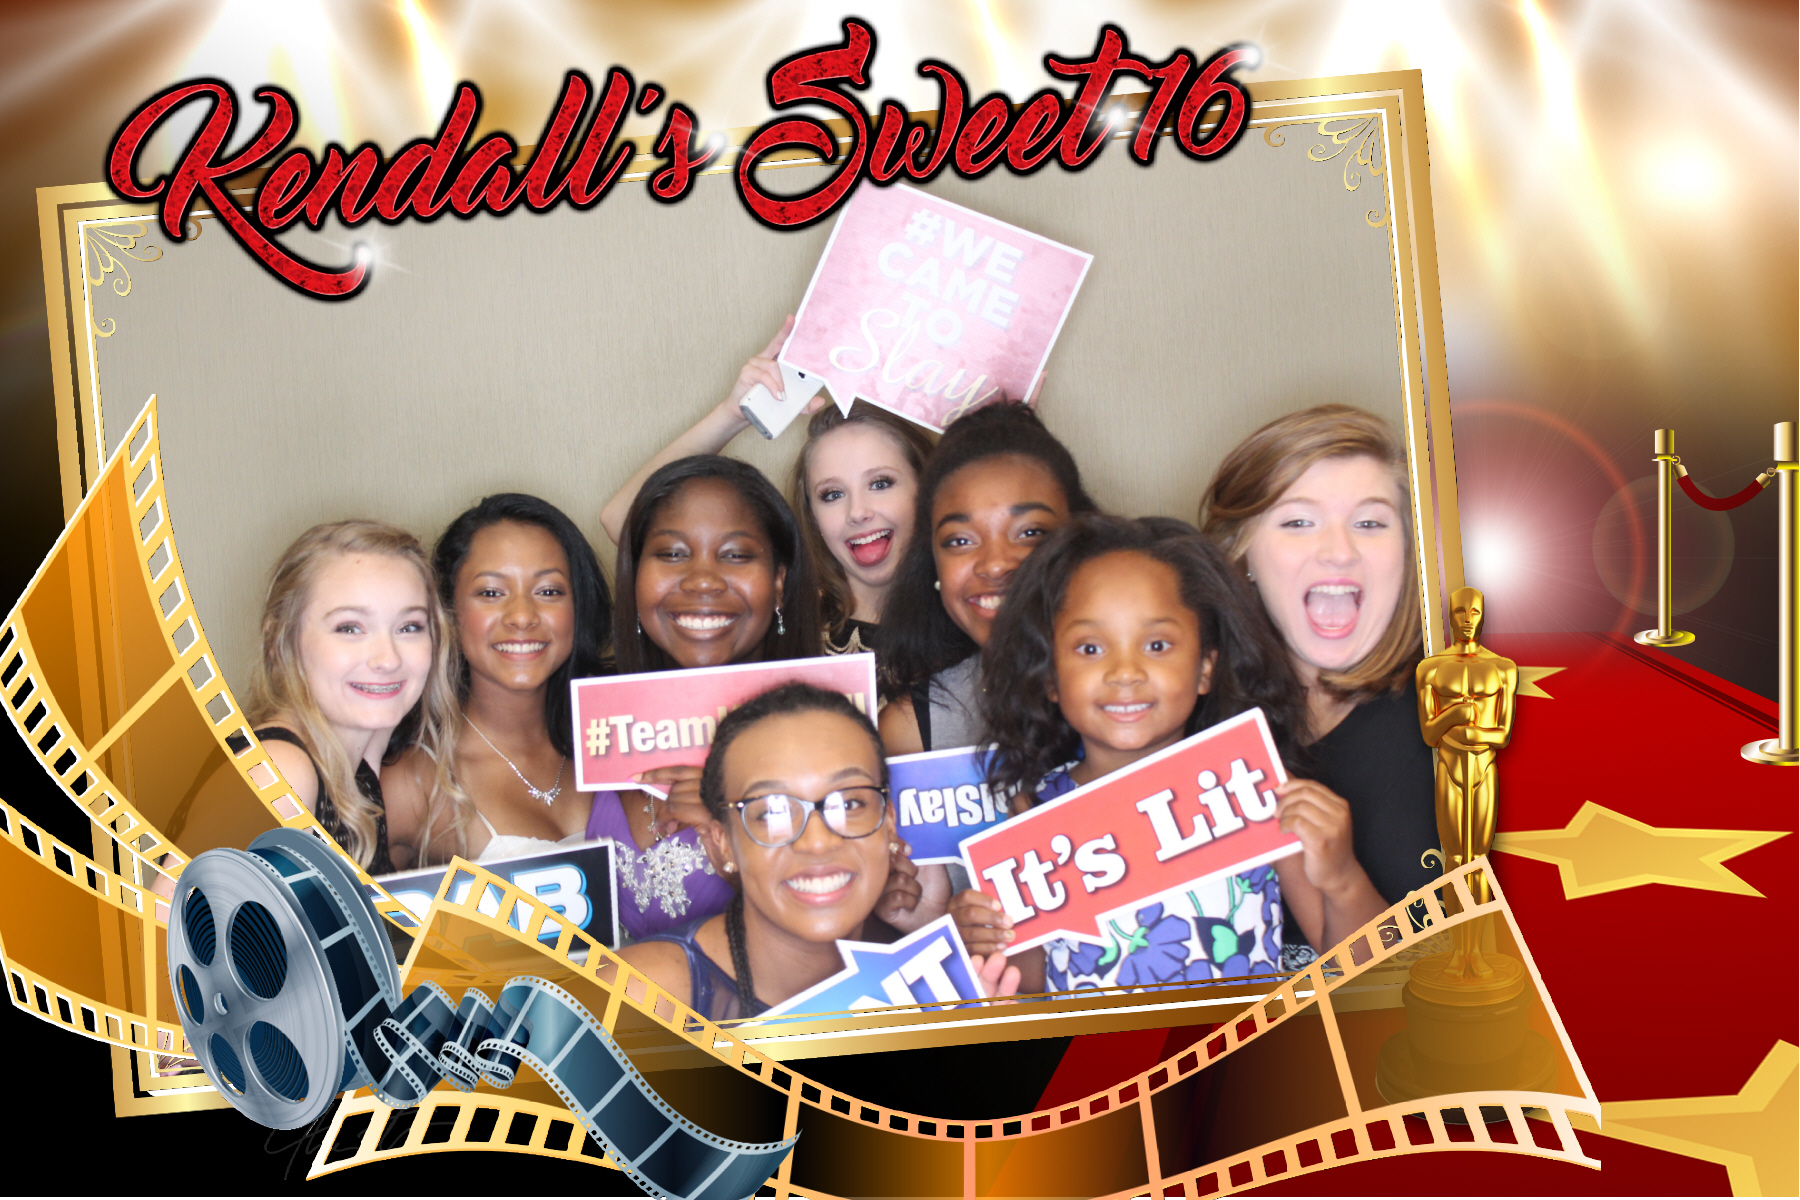 Kendall Sweet 16